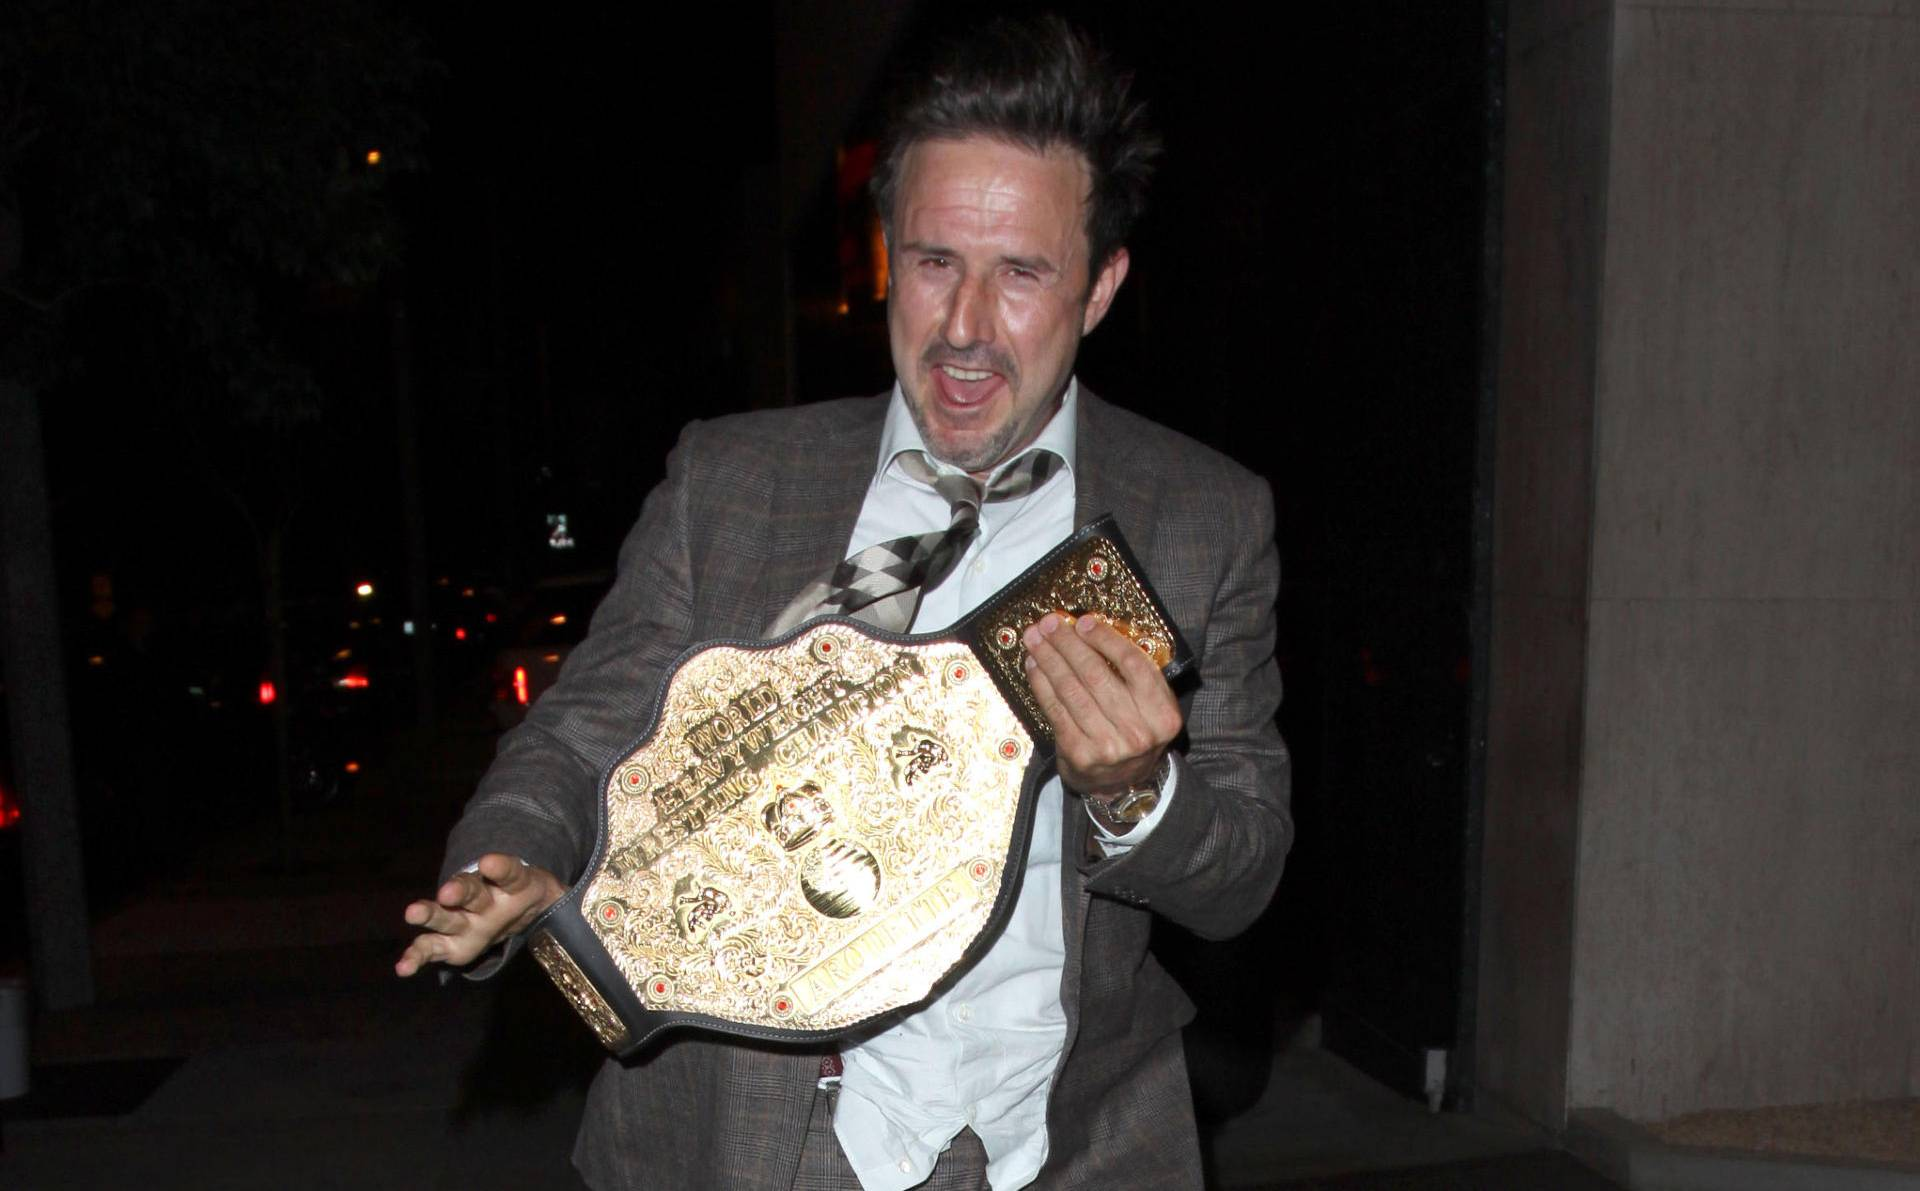 super tanie ekskluzywne buty aliexpress David Arquette Ran Around With a WCW Belt | The Blemish